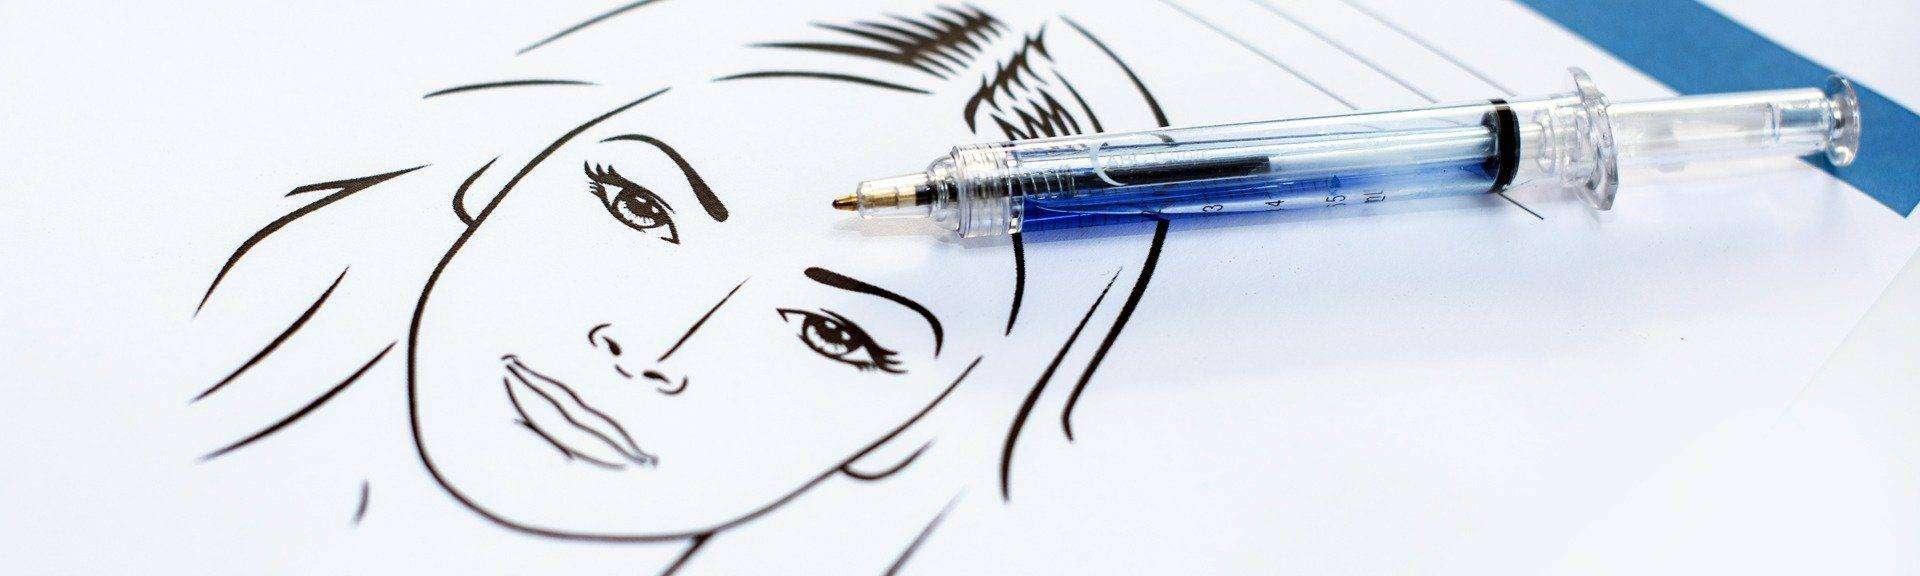 behandelingen - injectables - fronsrimpel